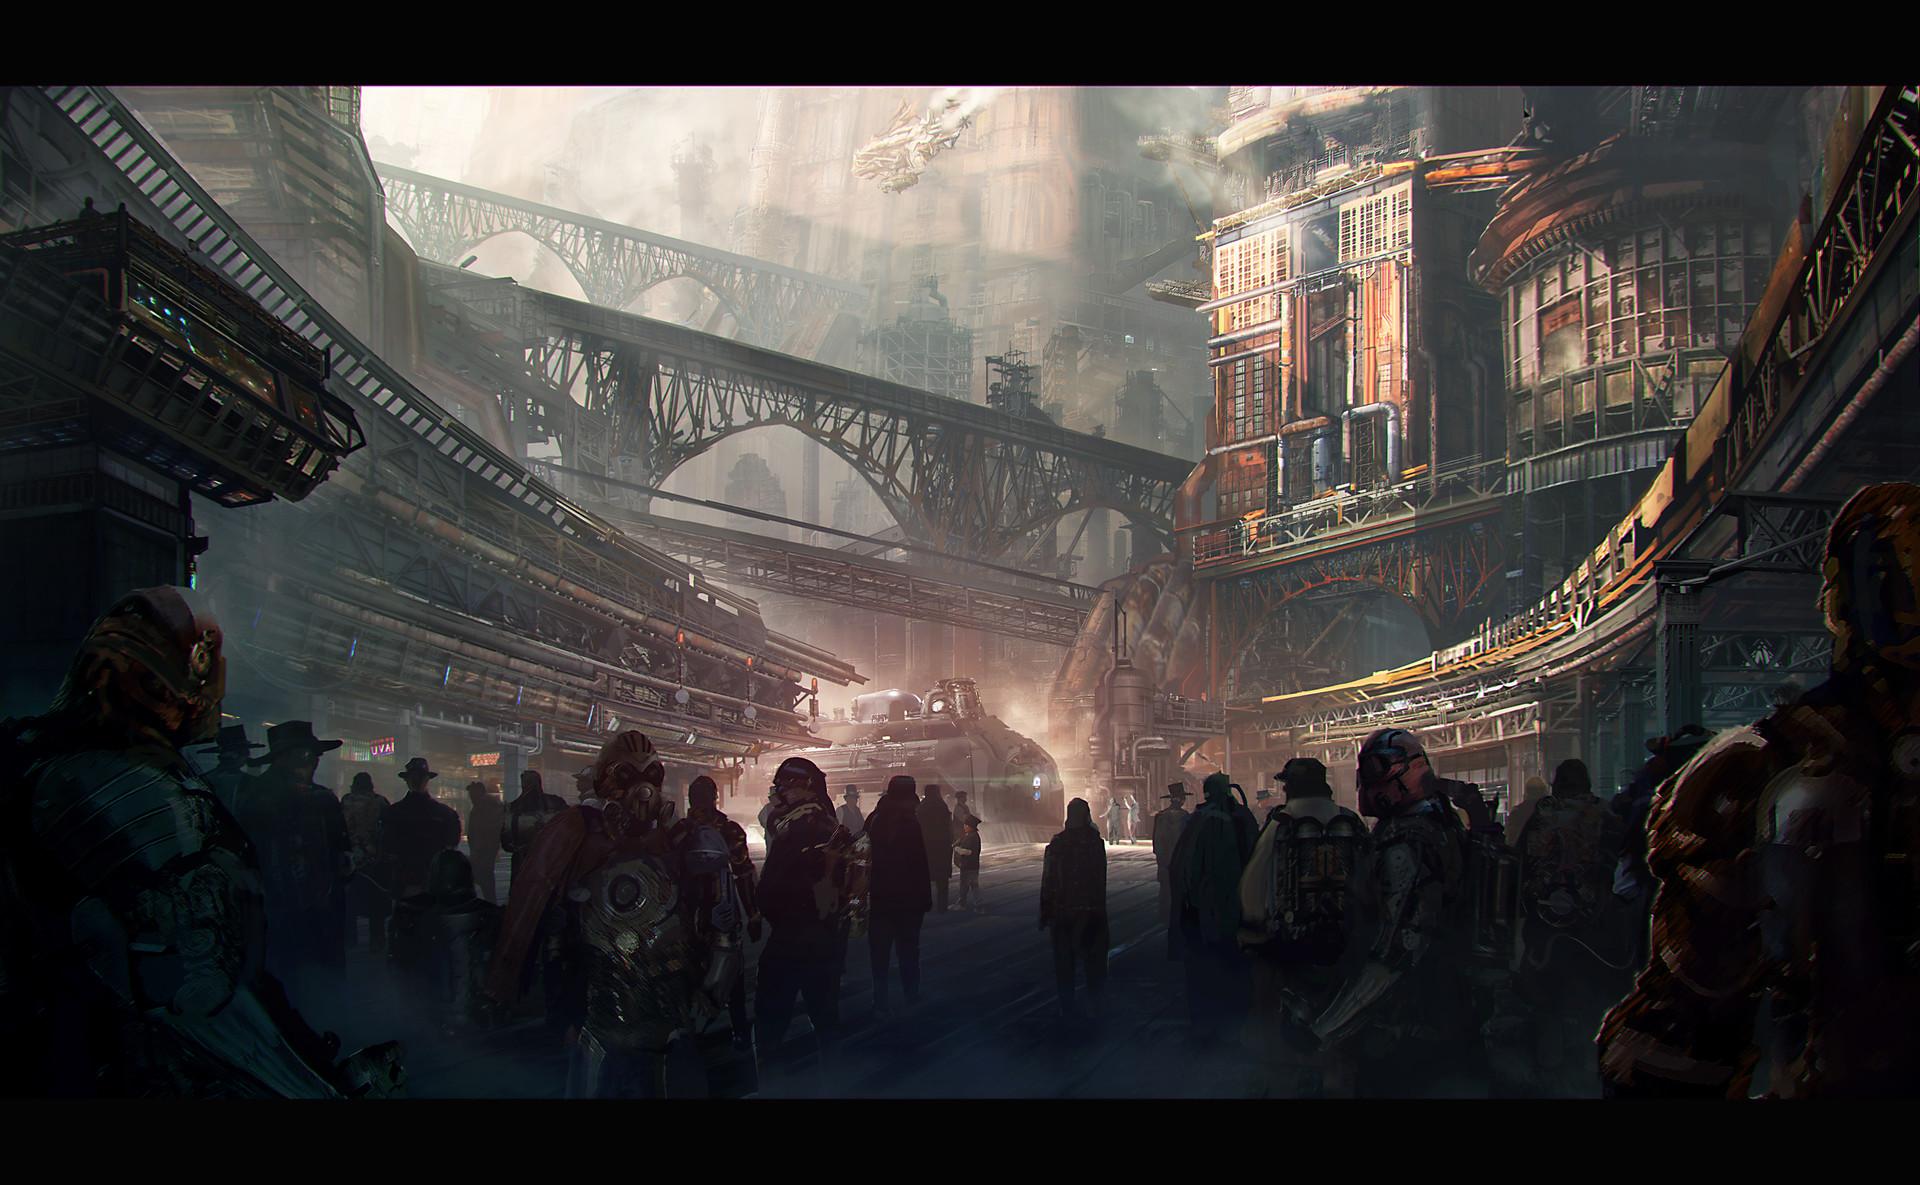 ArtStation - steampunk city 2, fujihiko sawai